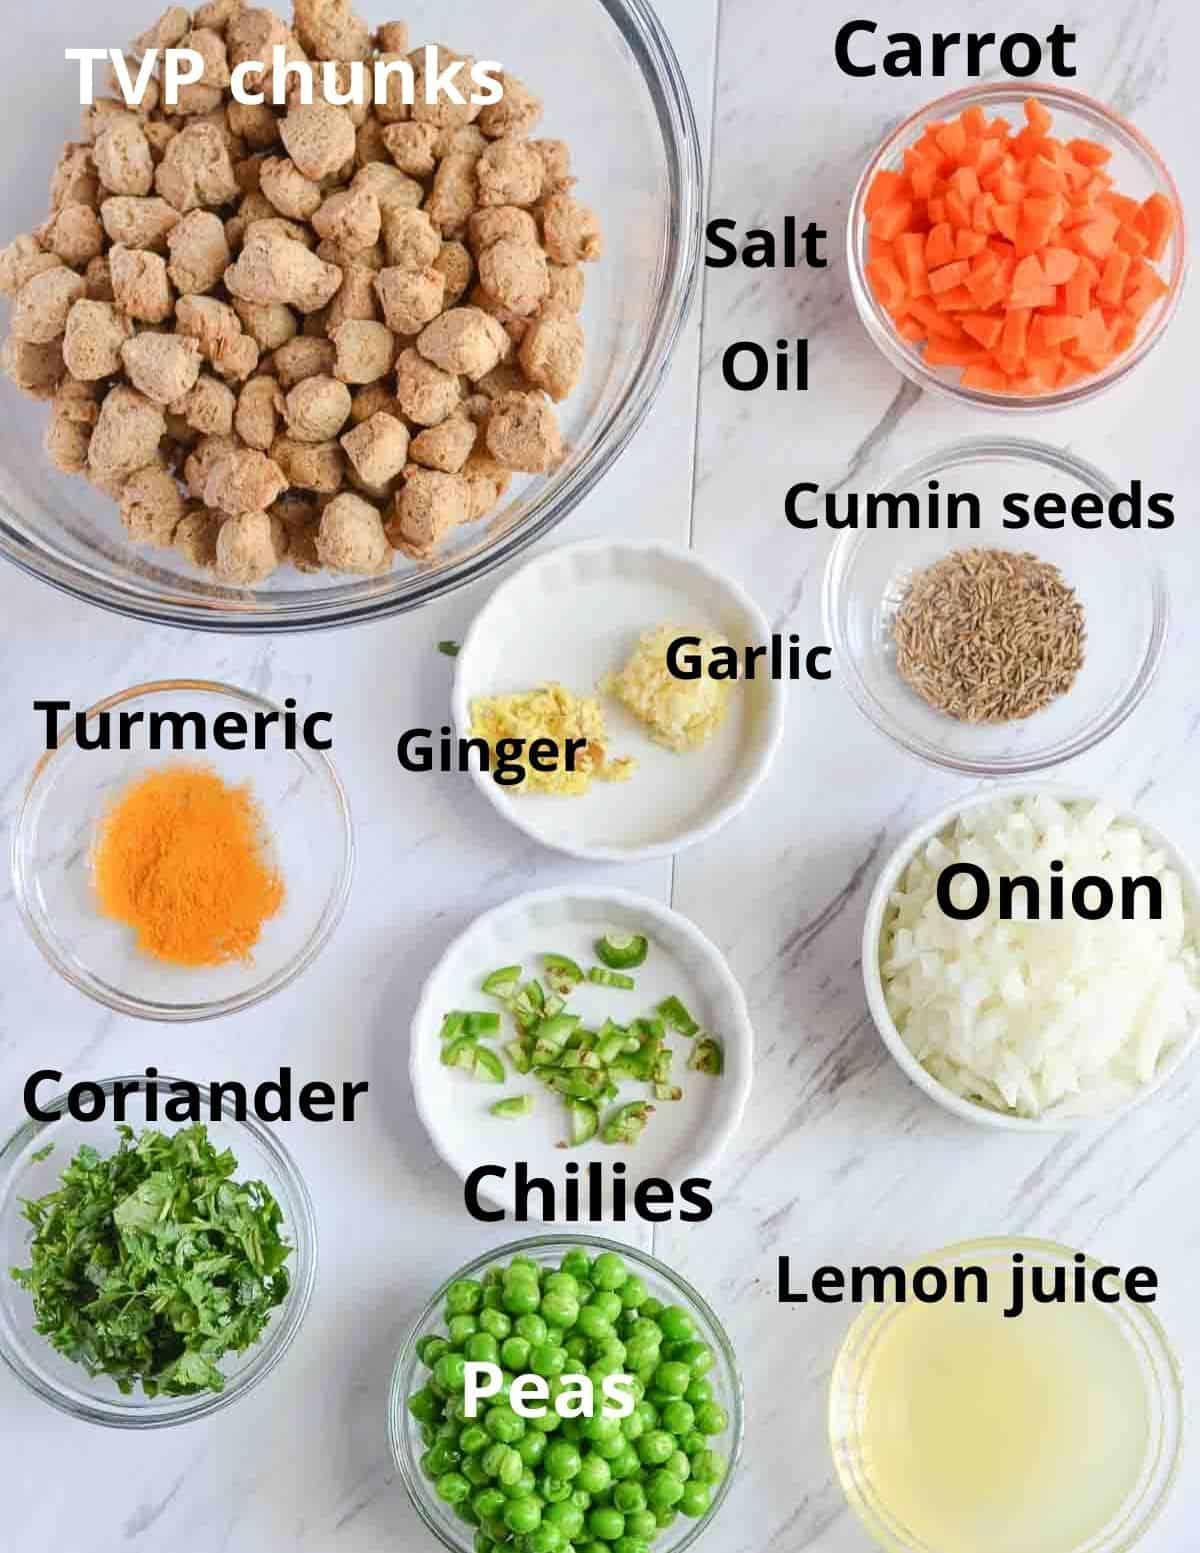 ingredients list to make textured vegetable protein breakfast scramble.